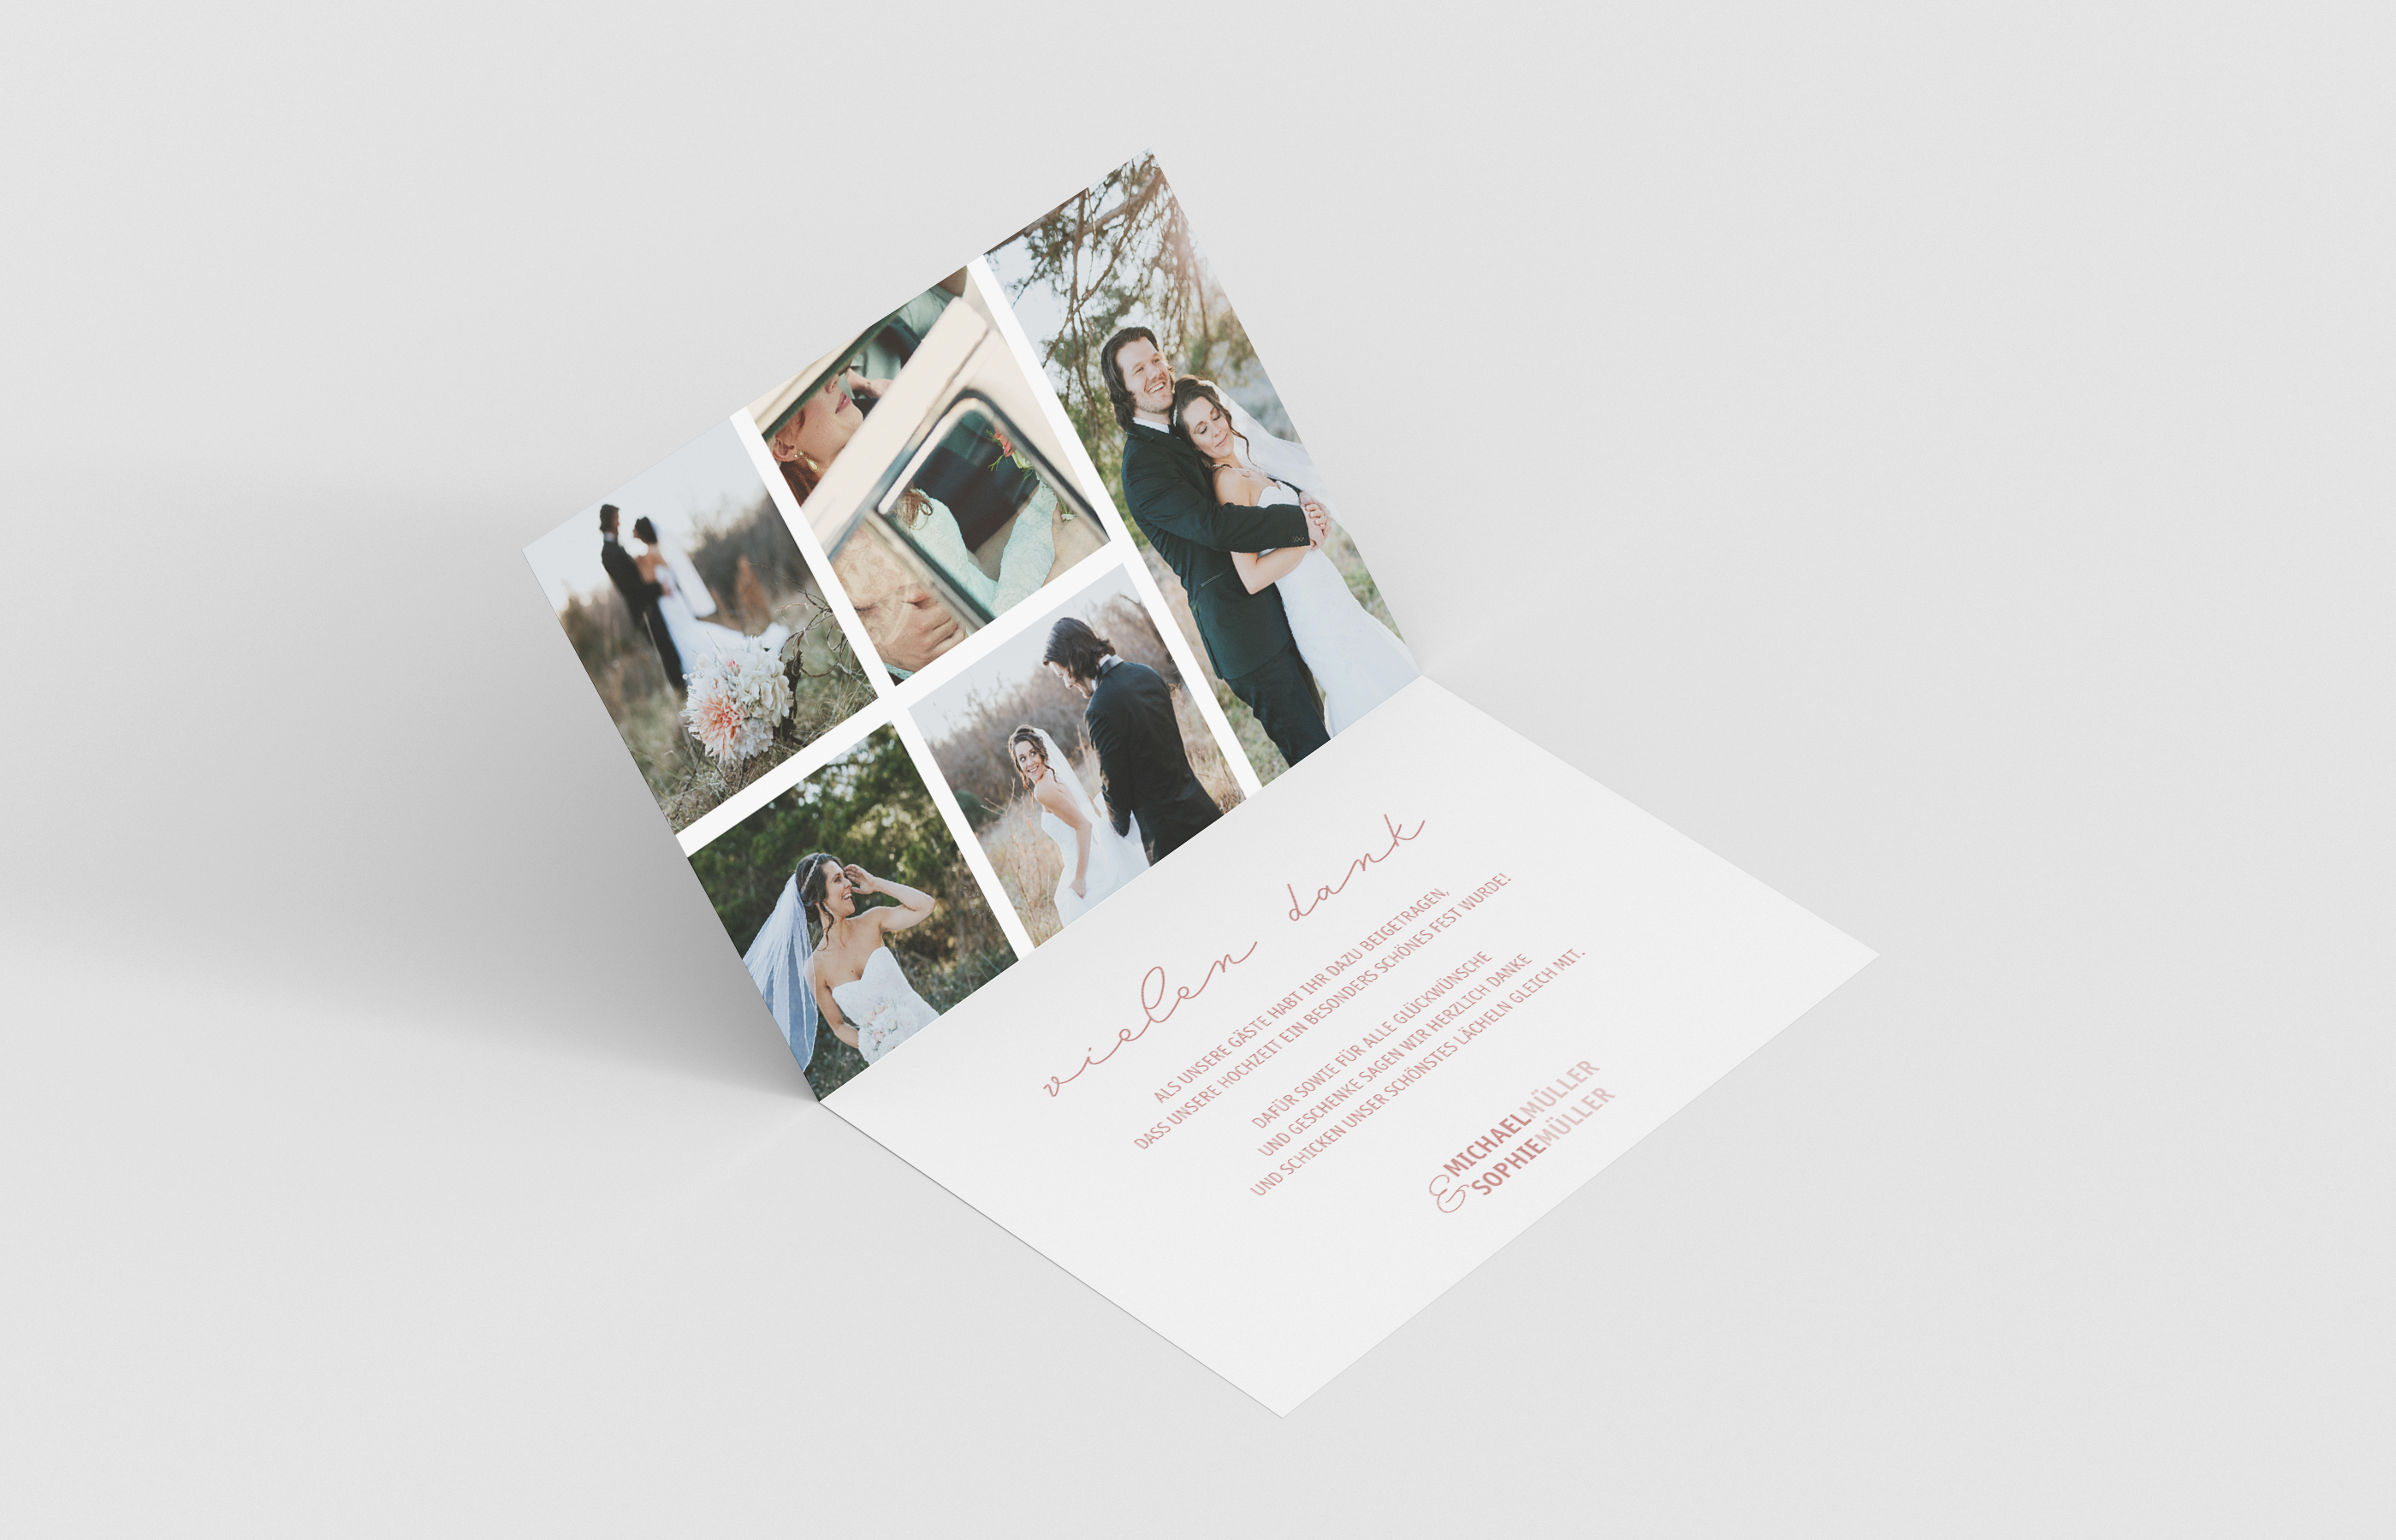 Danksagungskarte Hochzeit Accessoire